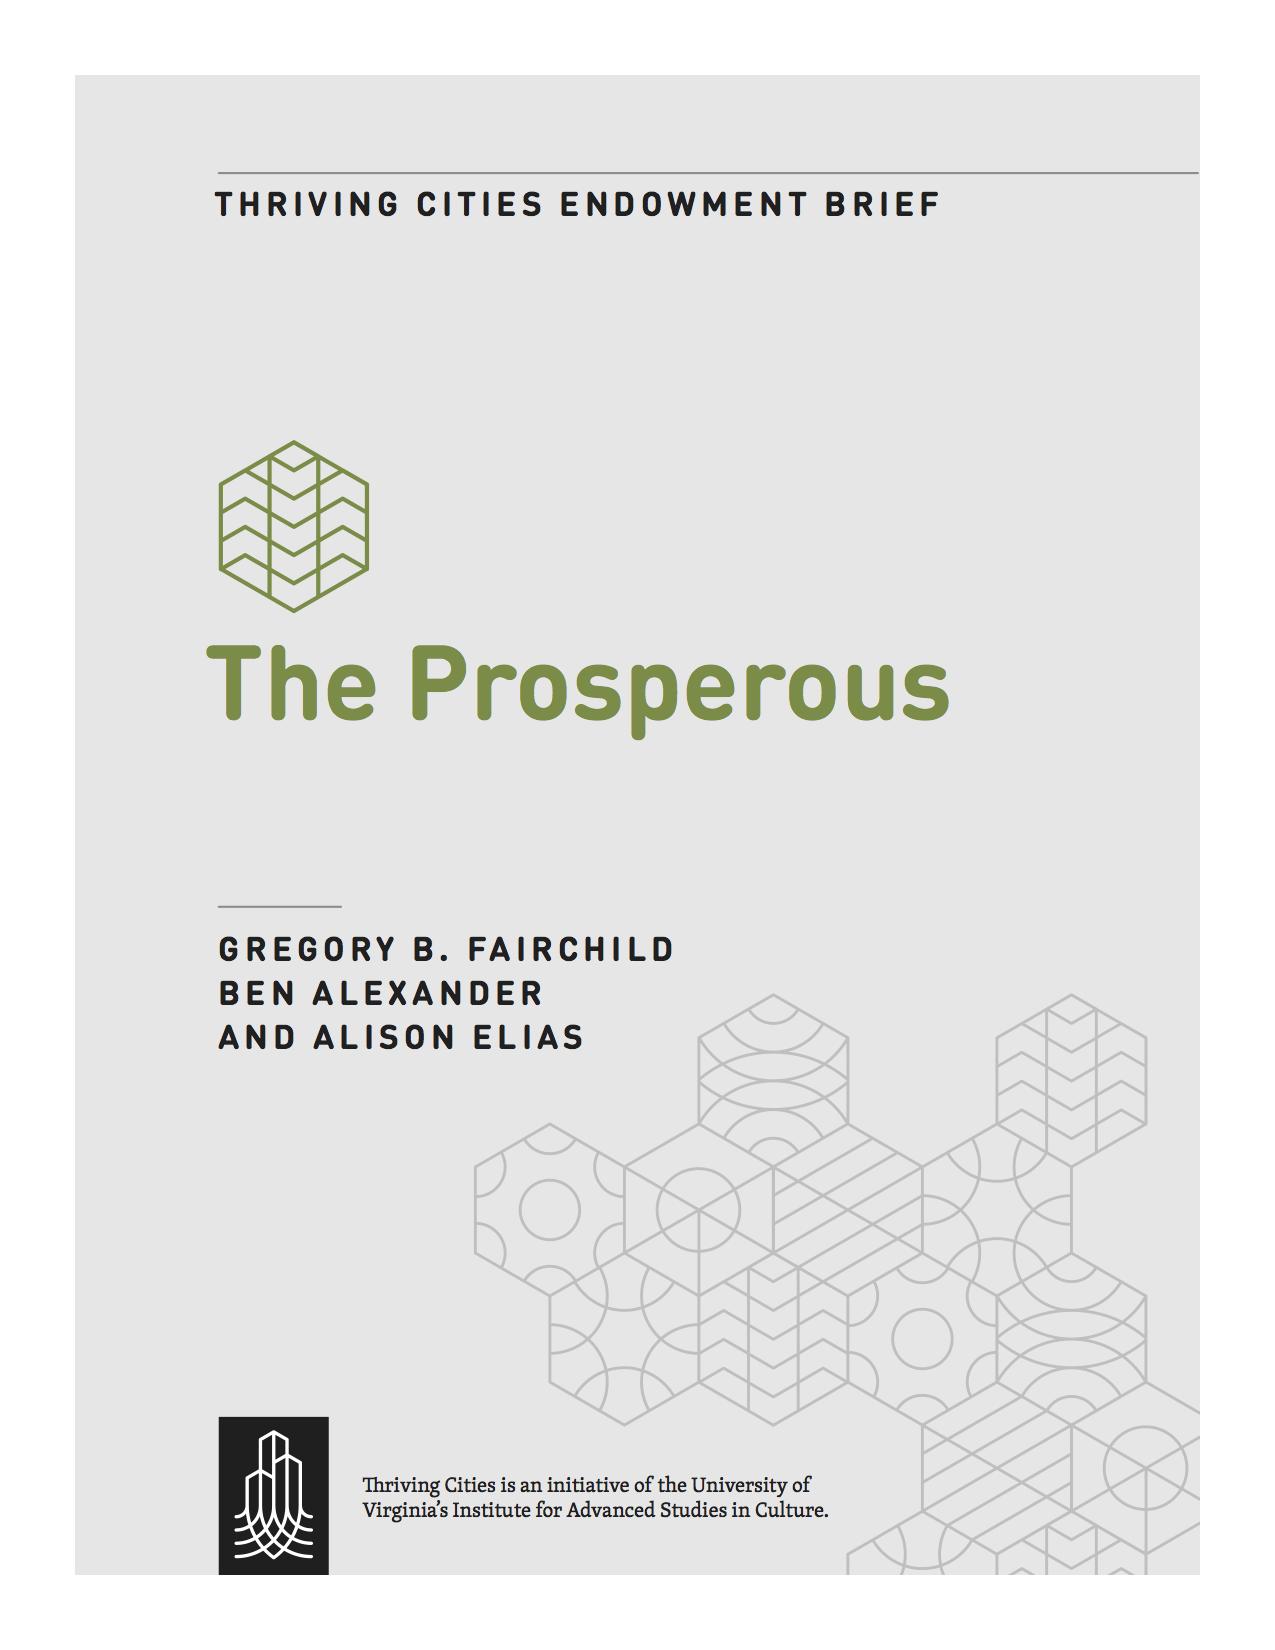 Endowment-Brief-The-Prosperous.png